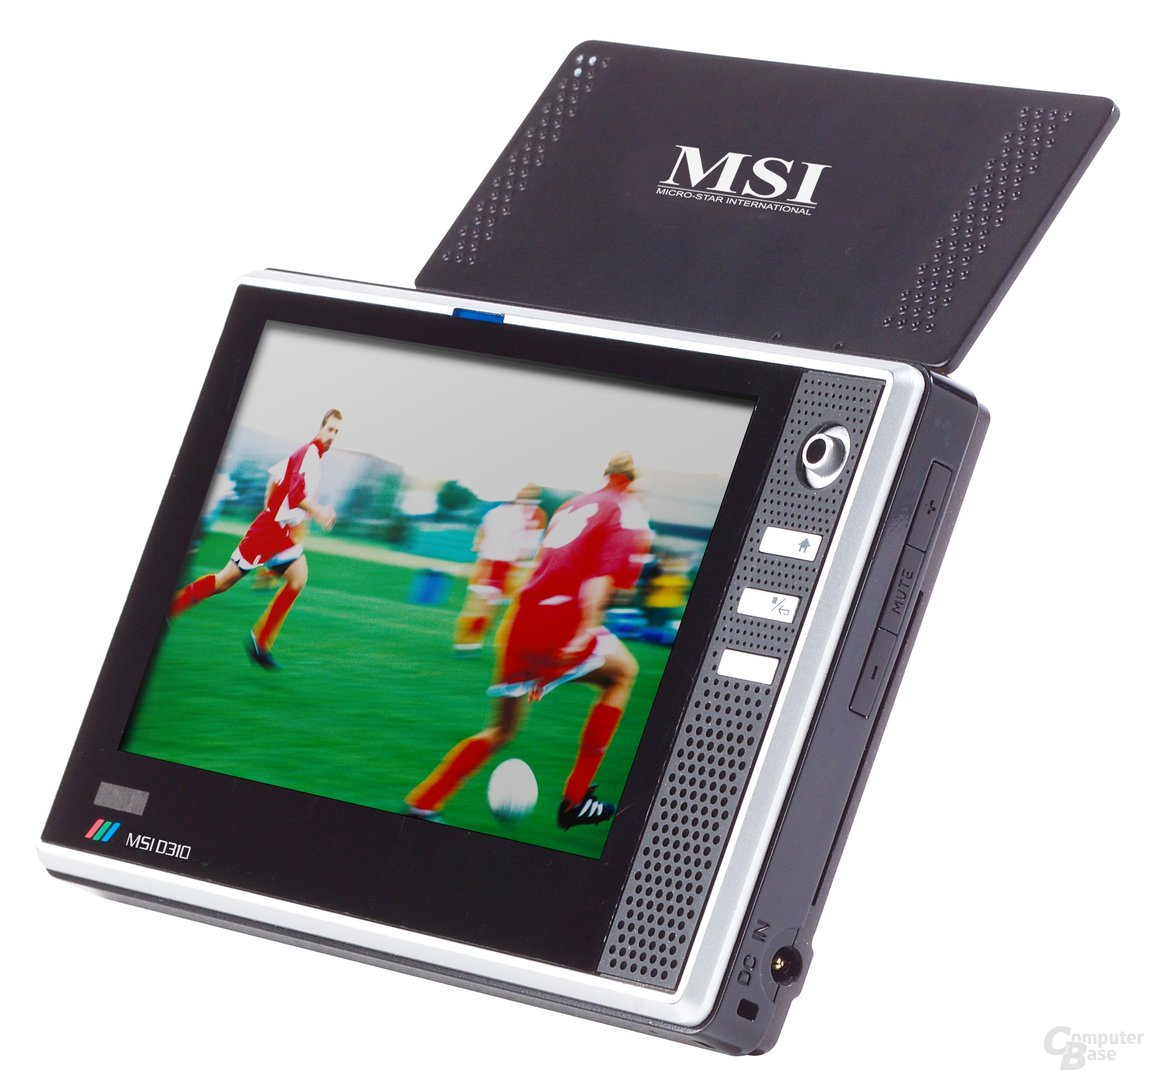 MSI Pocket TV D310